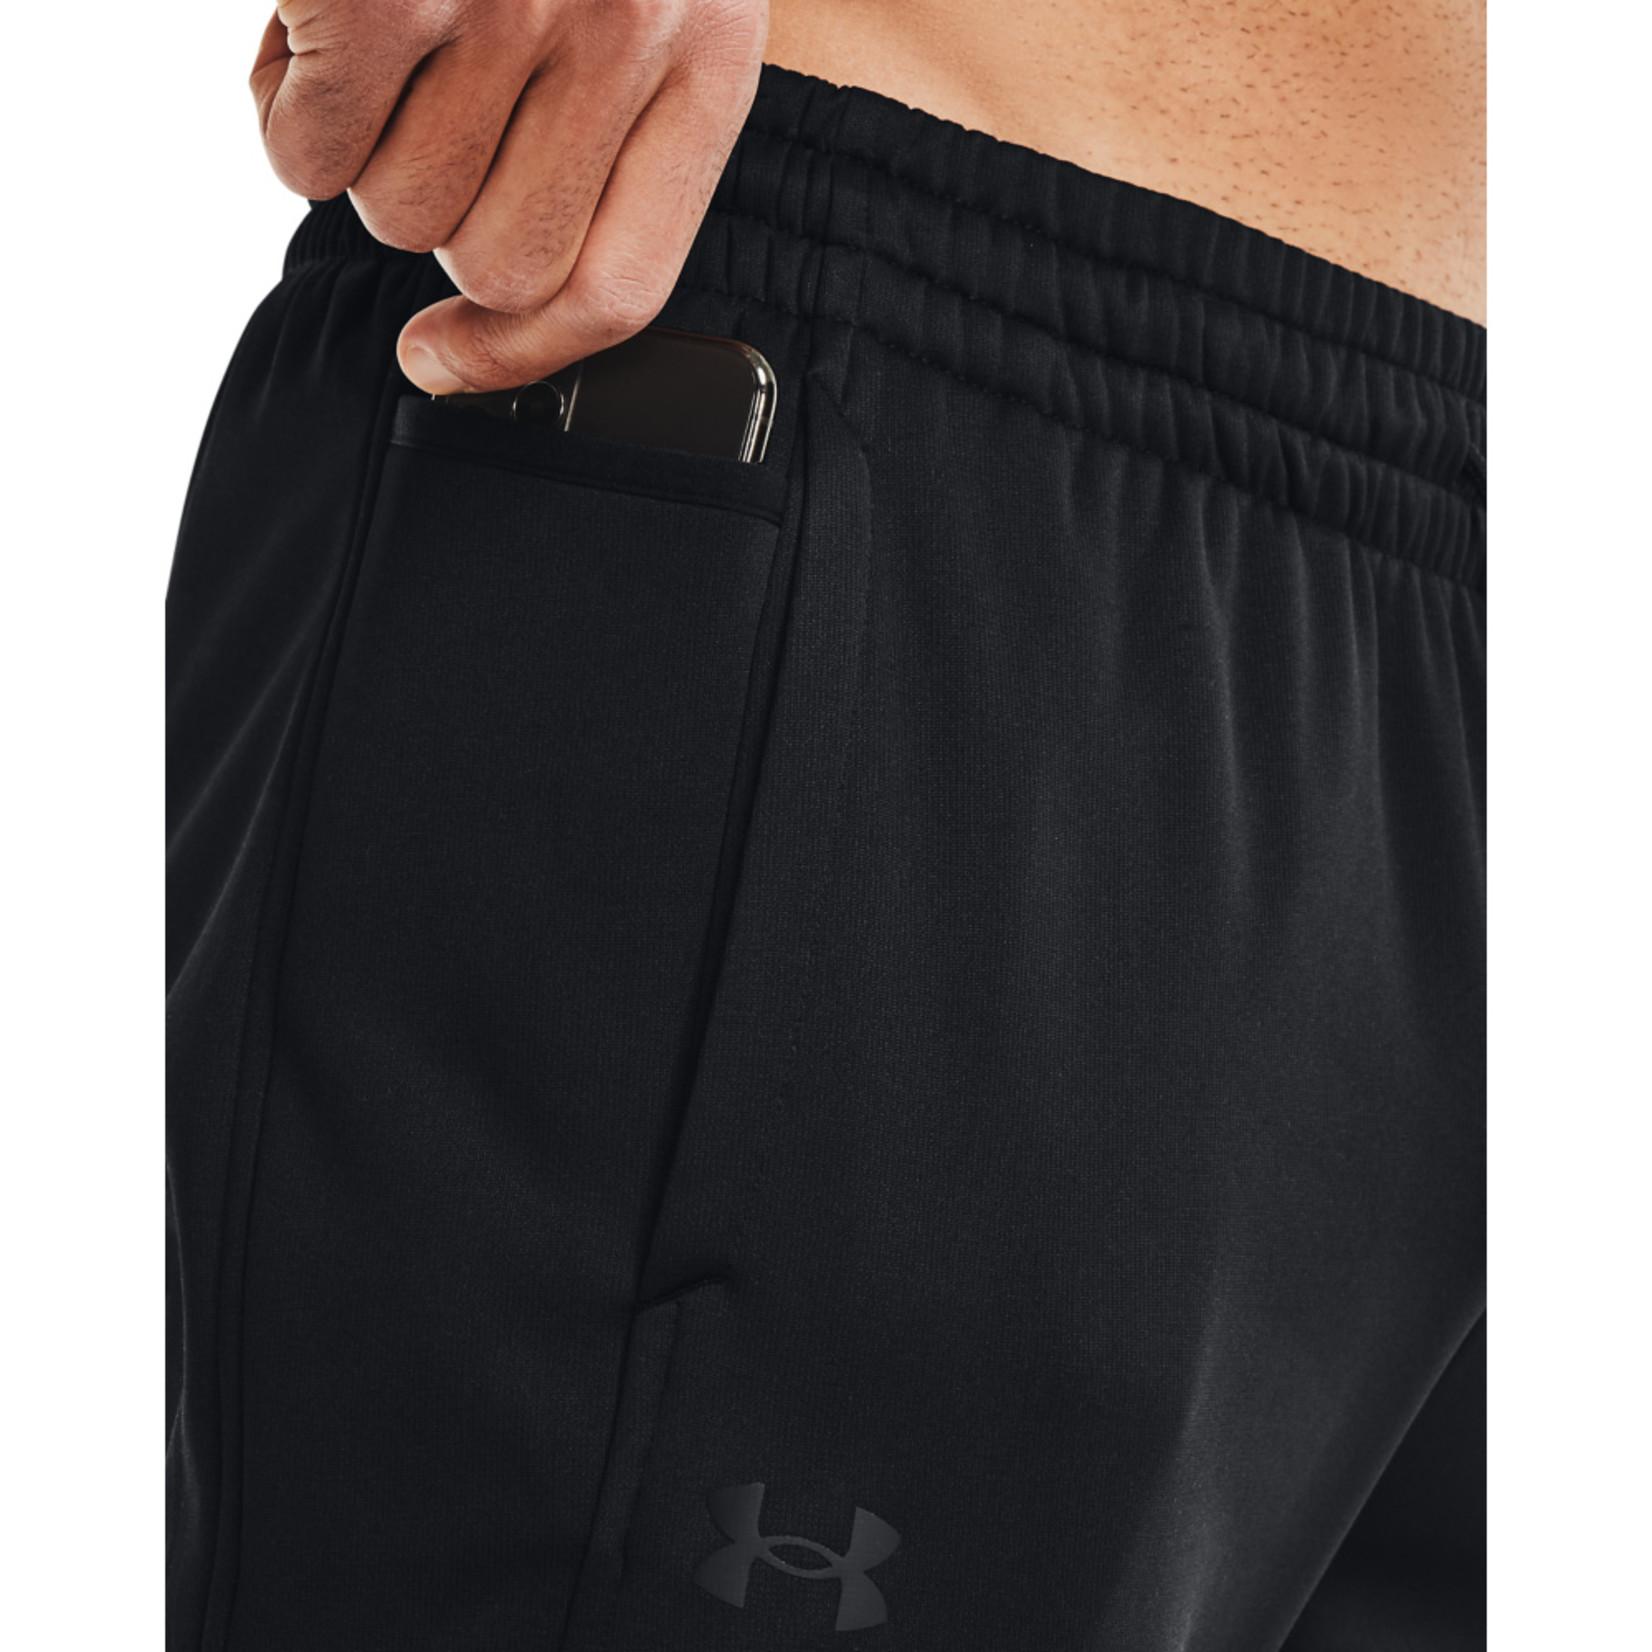 Under Armour UA Armour Fleece Pants-Black